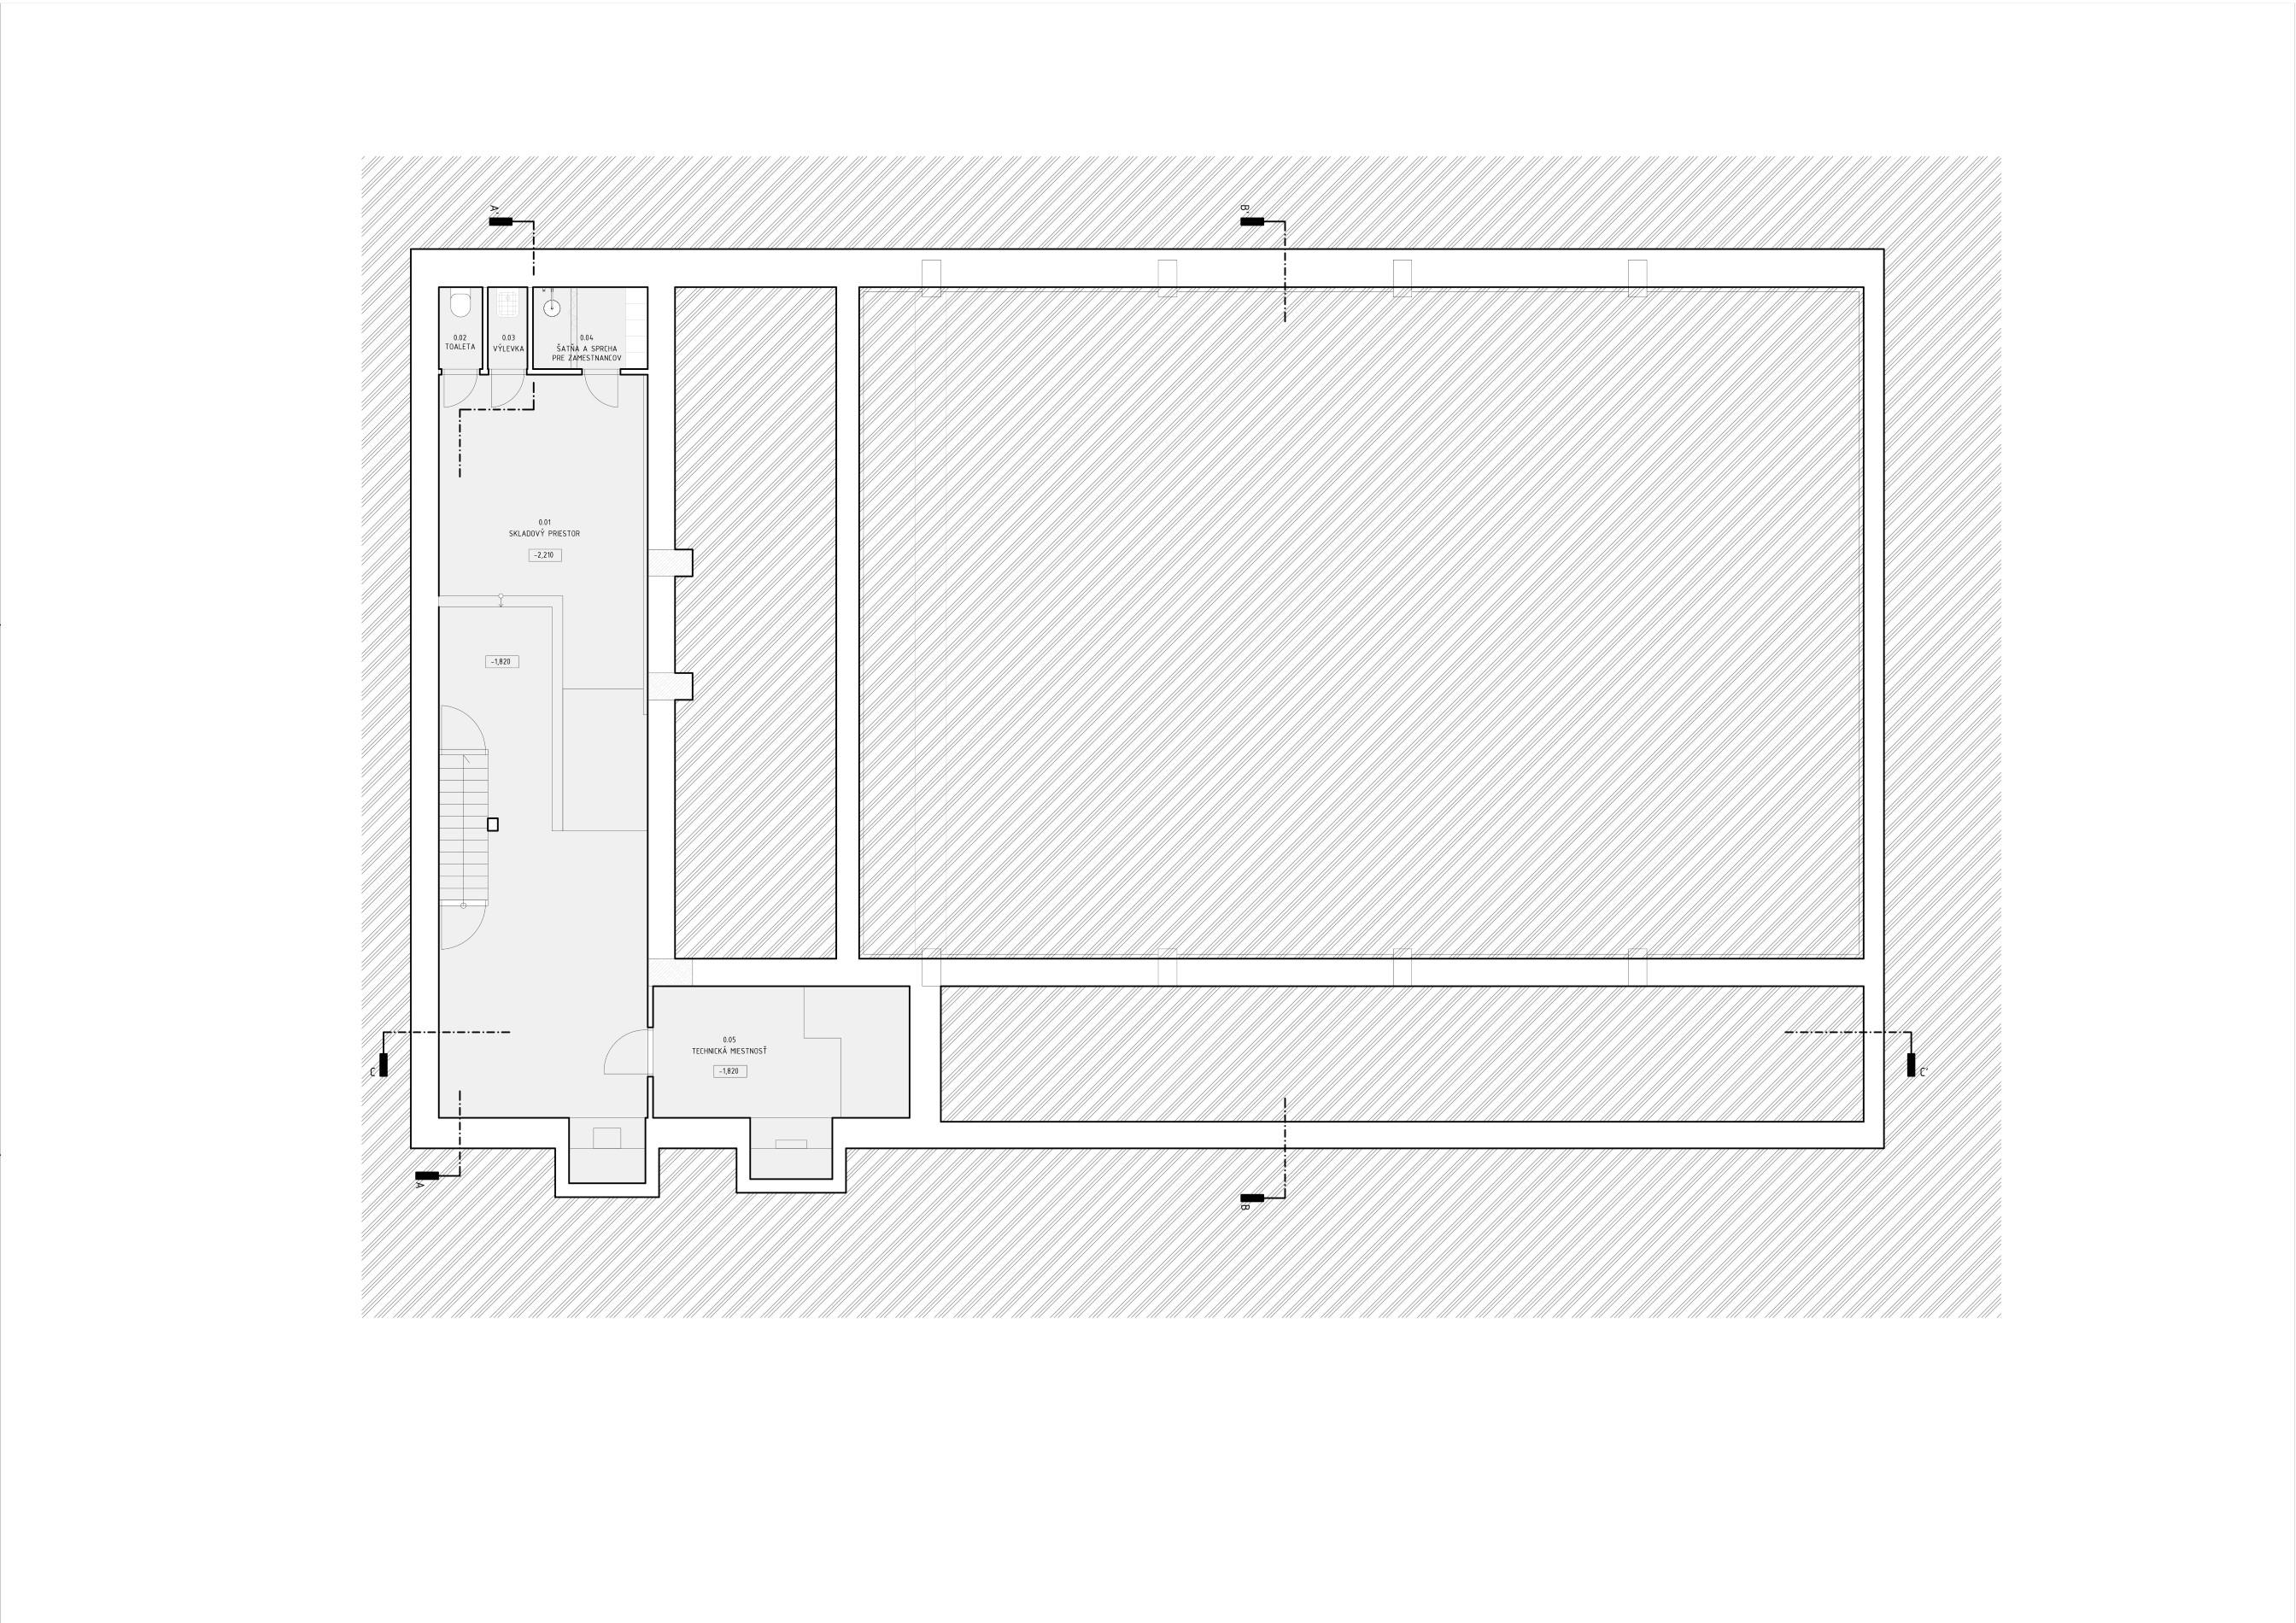 KINO-PALACE-NITRA_JURAJ-HUBINSKY_01-PP.jpg